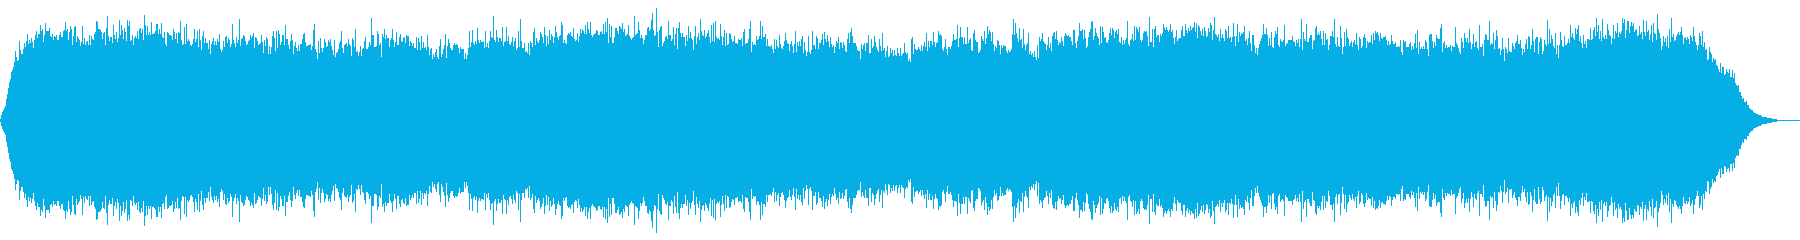 α波を促す癒しのヒーリングの再生済みの波形